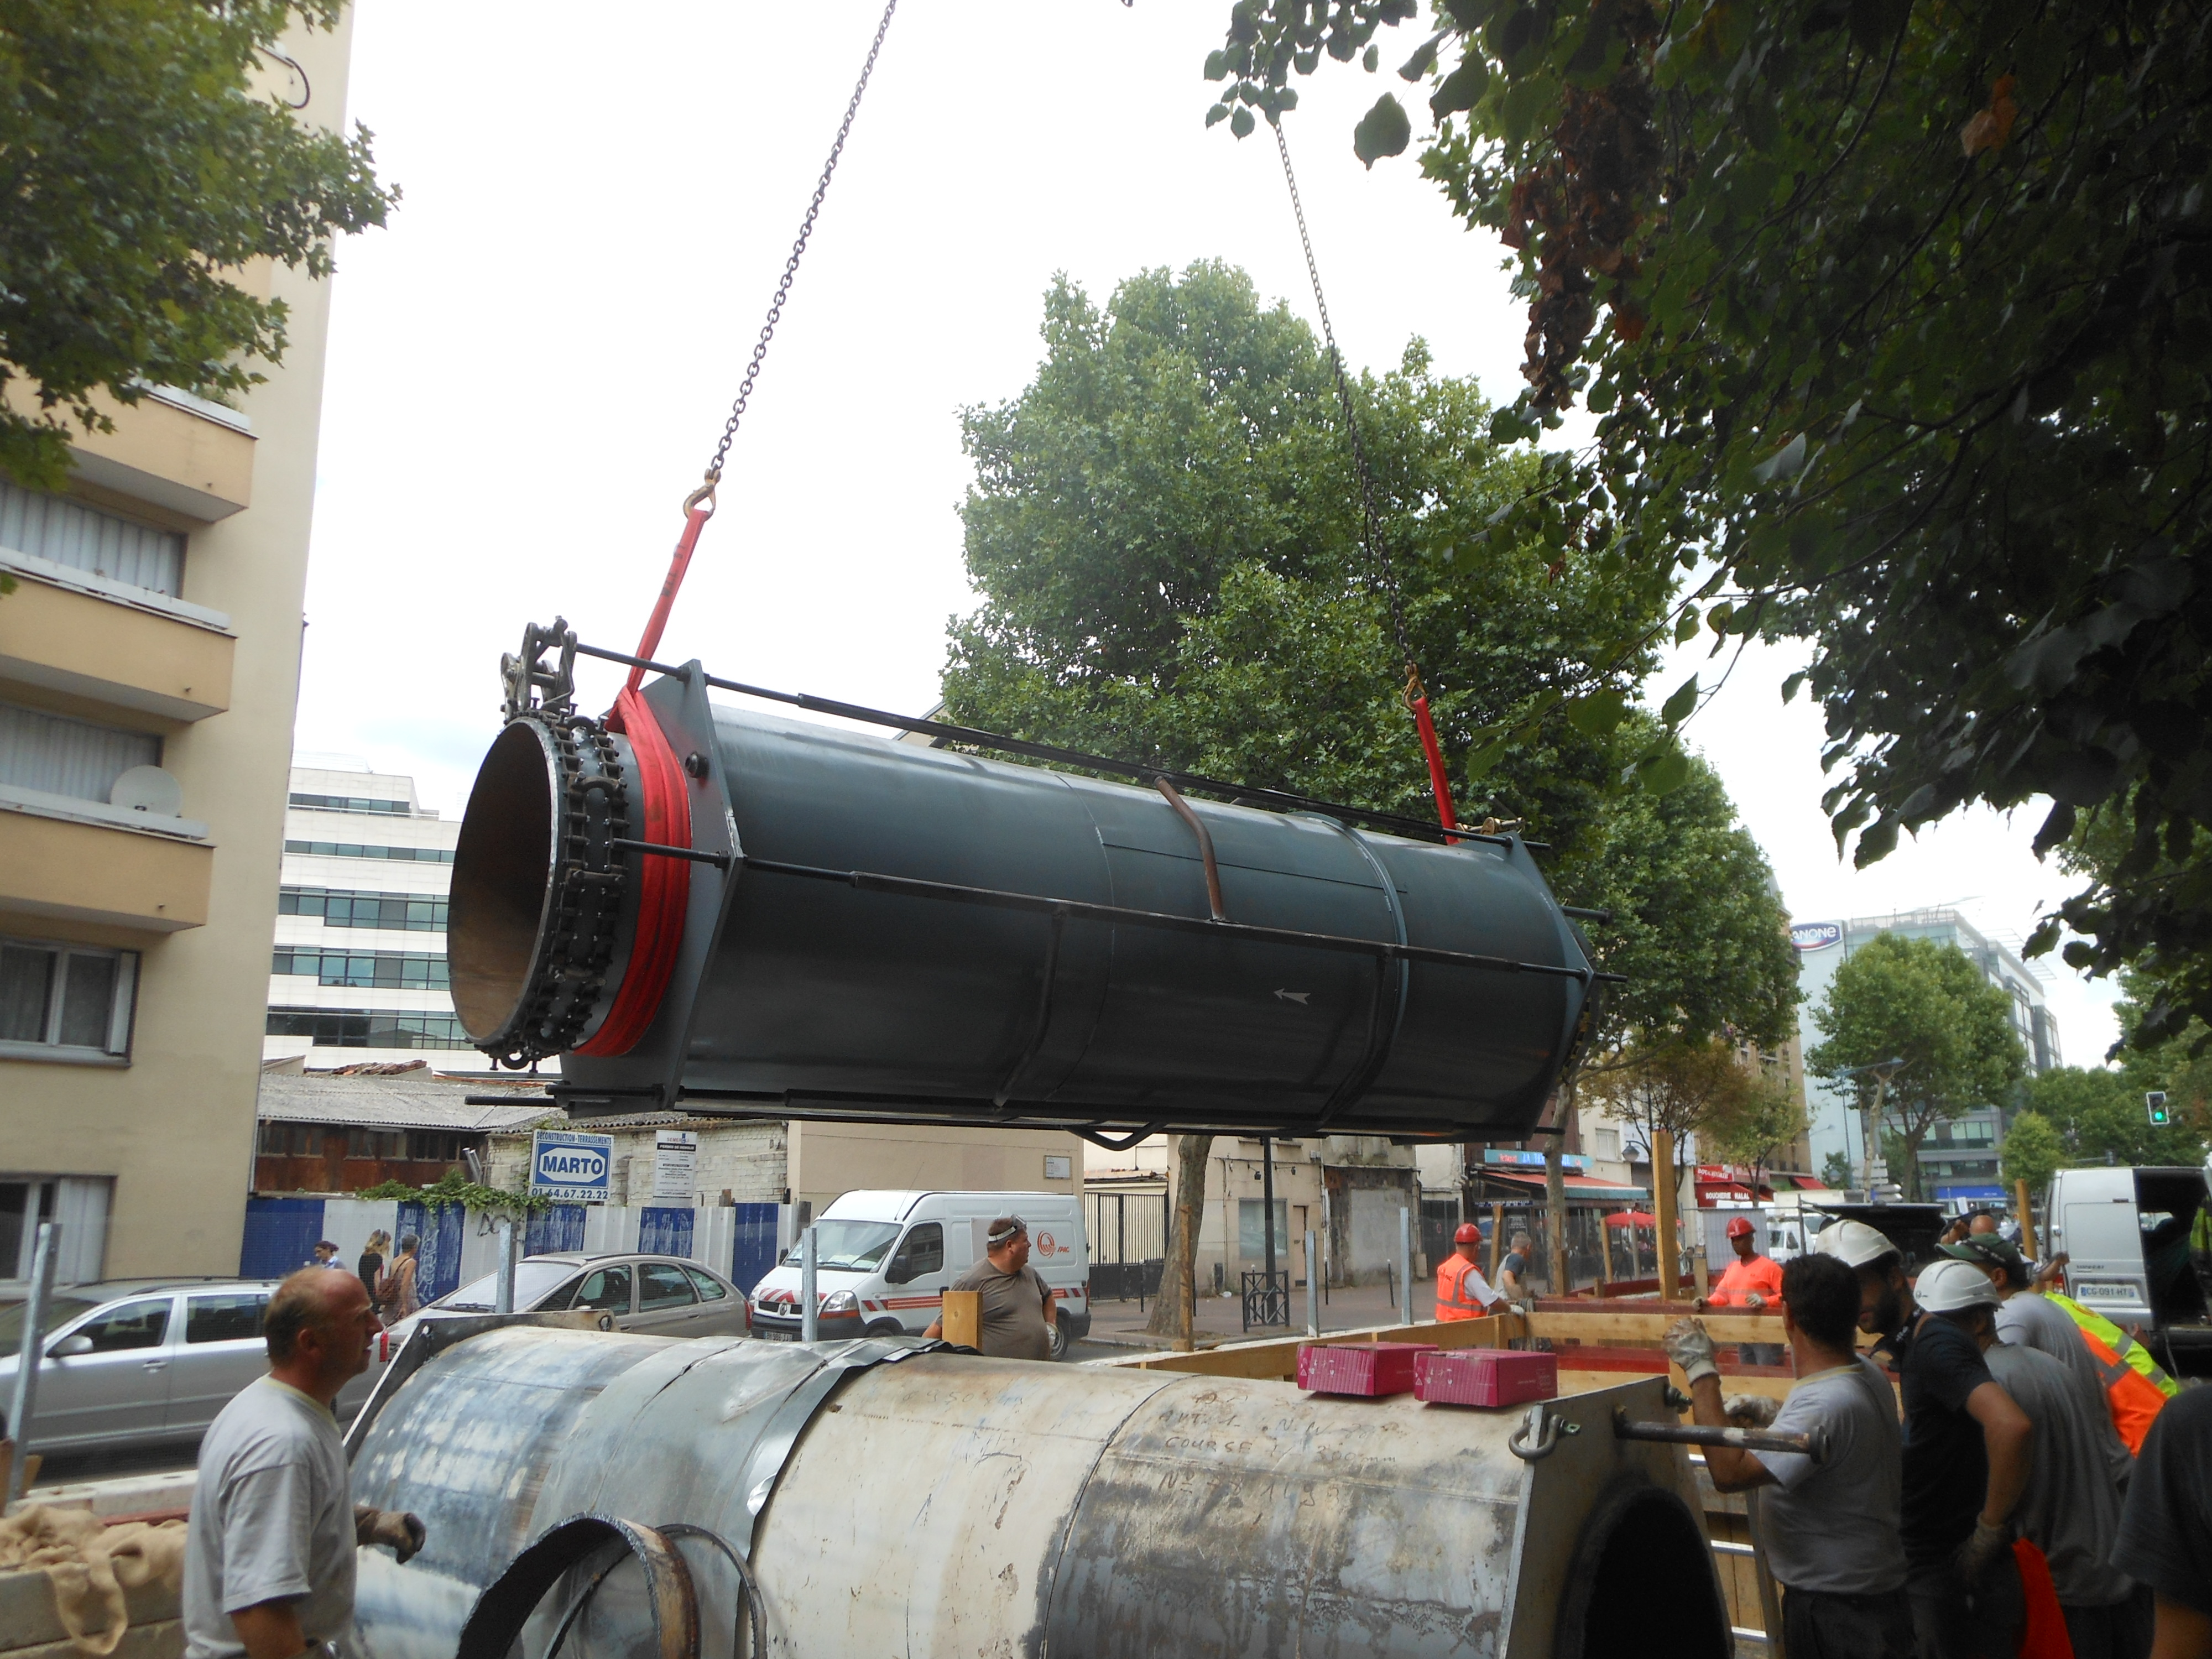 SFZ _ CPCU - Compensateur chauffage urbain